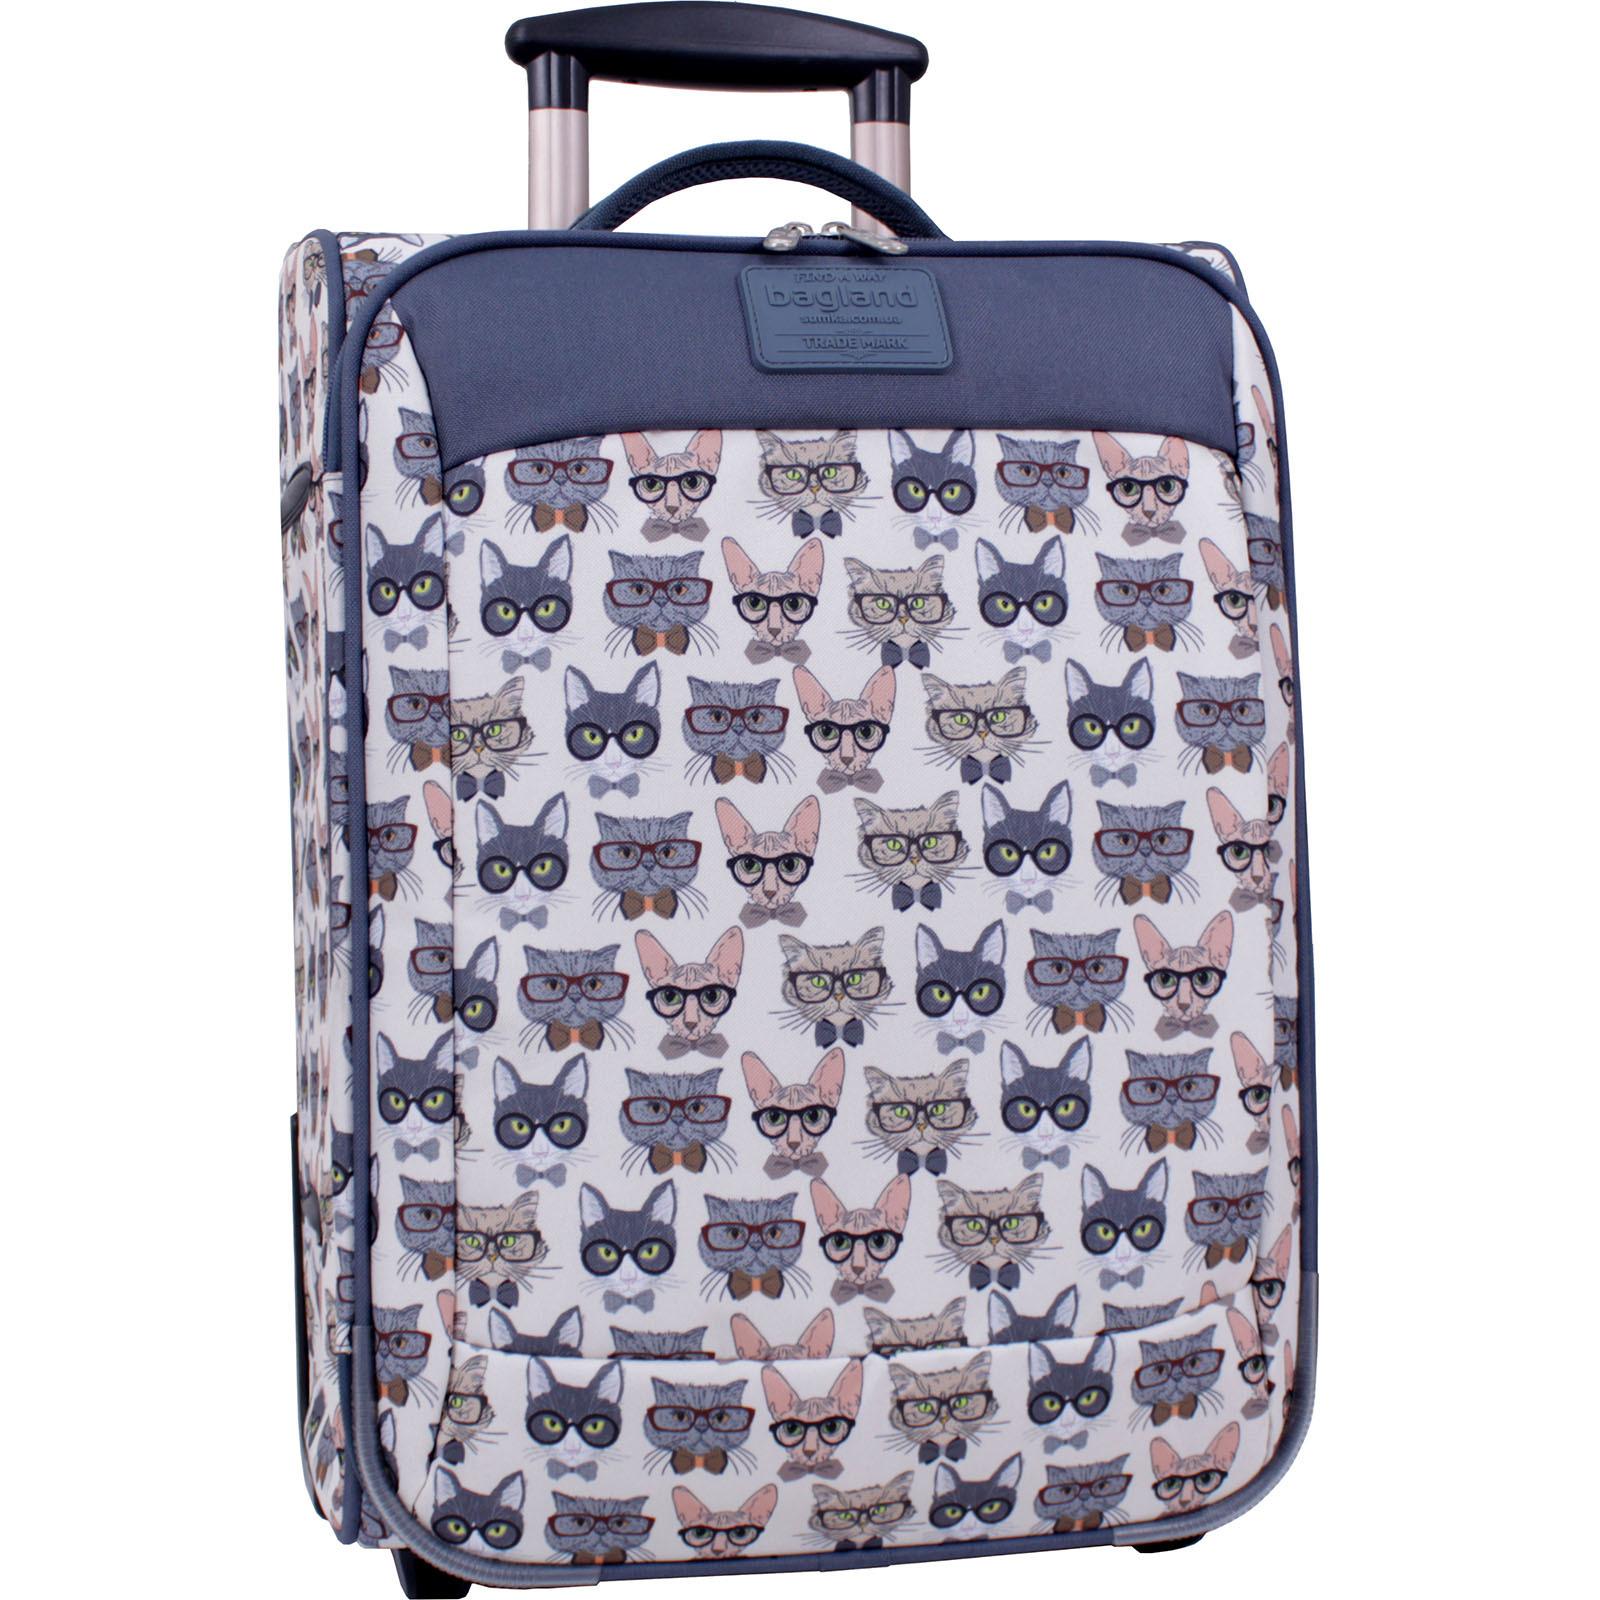 Дорожные чемоданы Чемодан Bagland Vichenzo 32 л. сублімація 28 (0037666194) IMG_7304_суб.28_.JPG